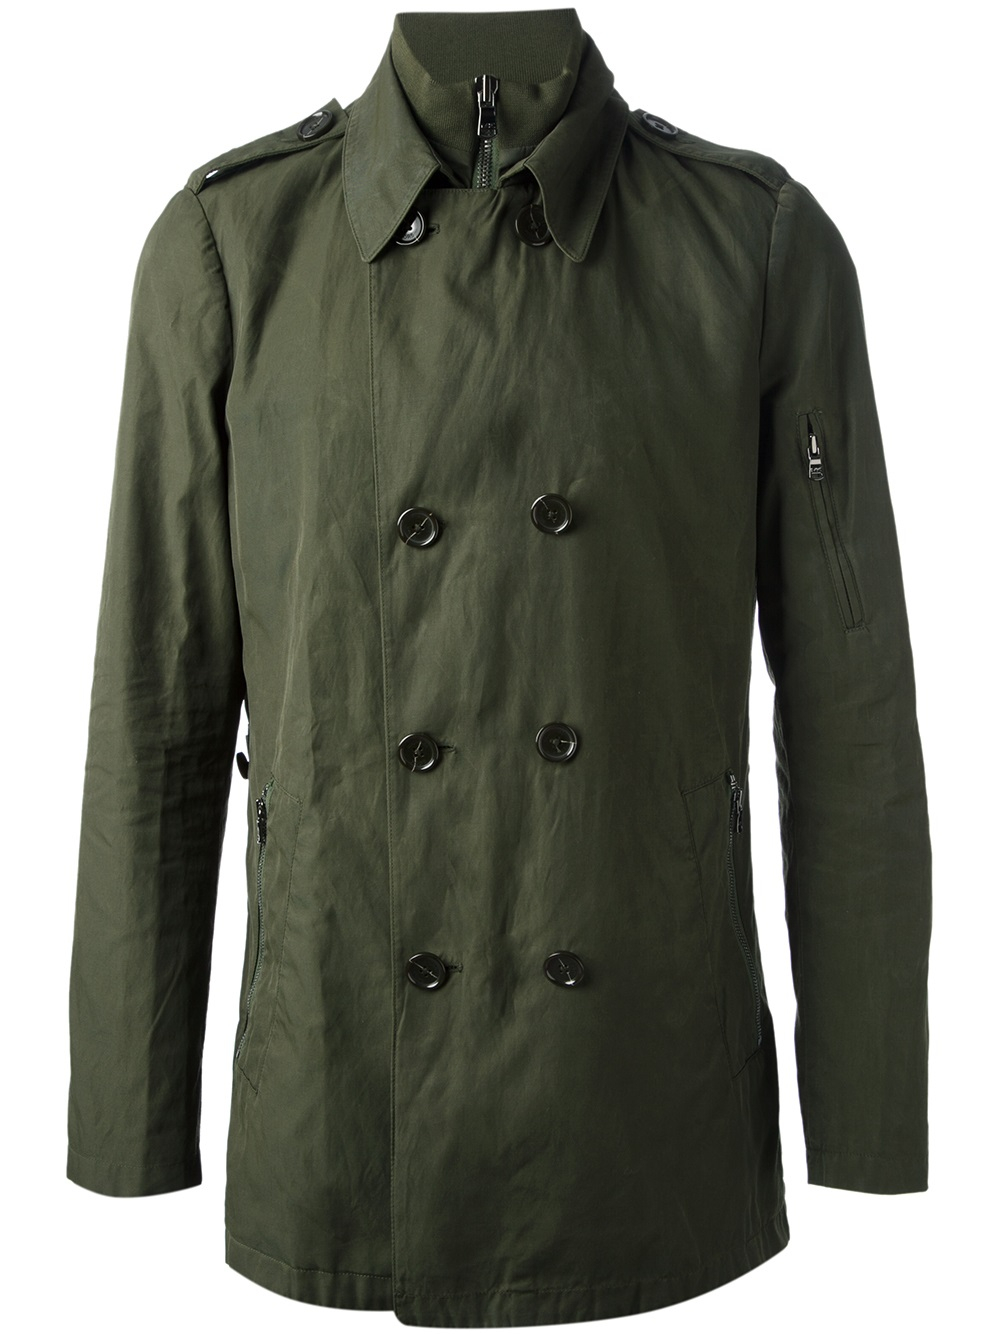 Lyst Michael Kors Military Trench Coat In Green For Men